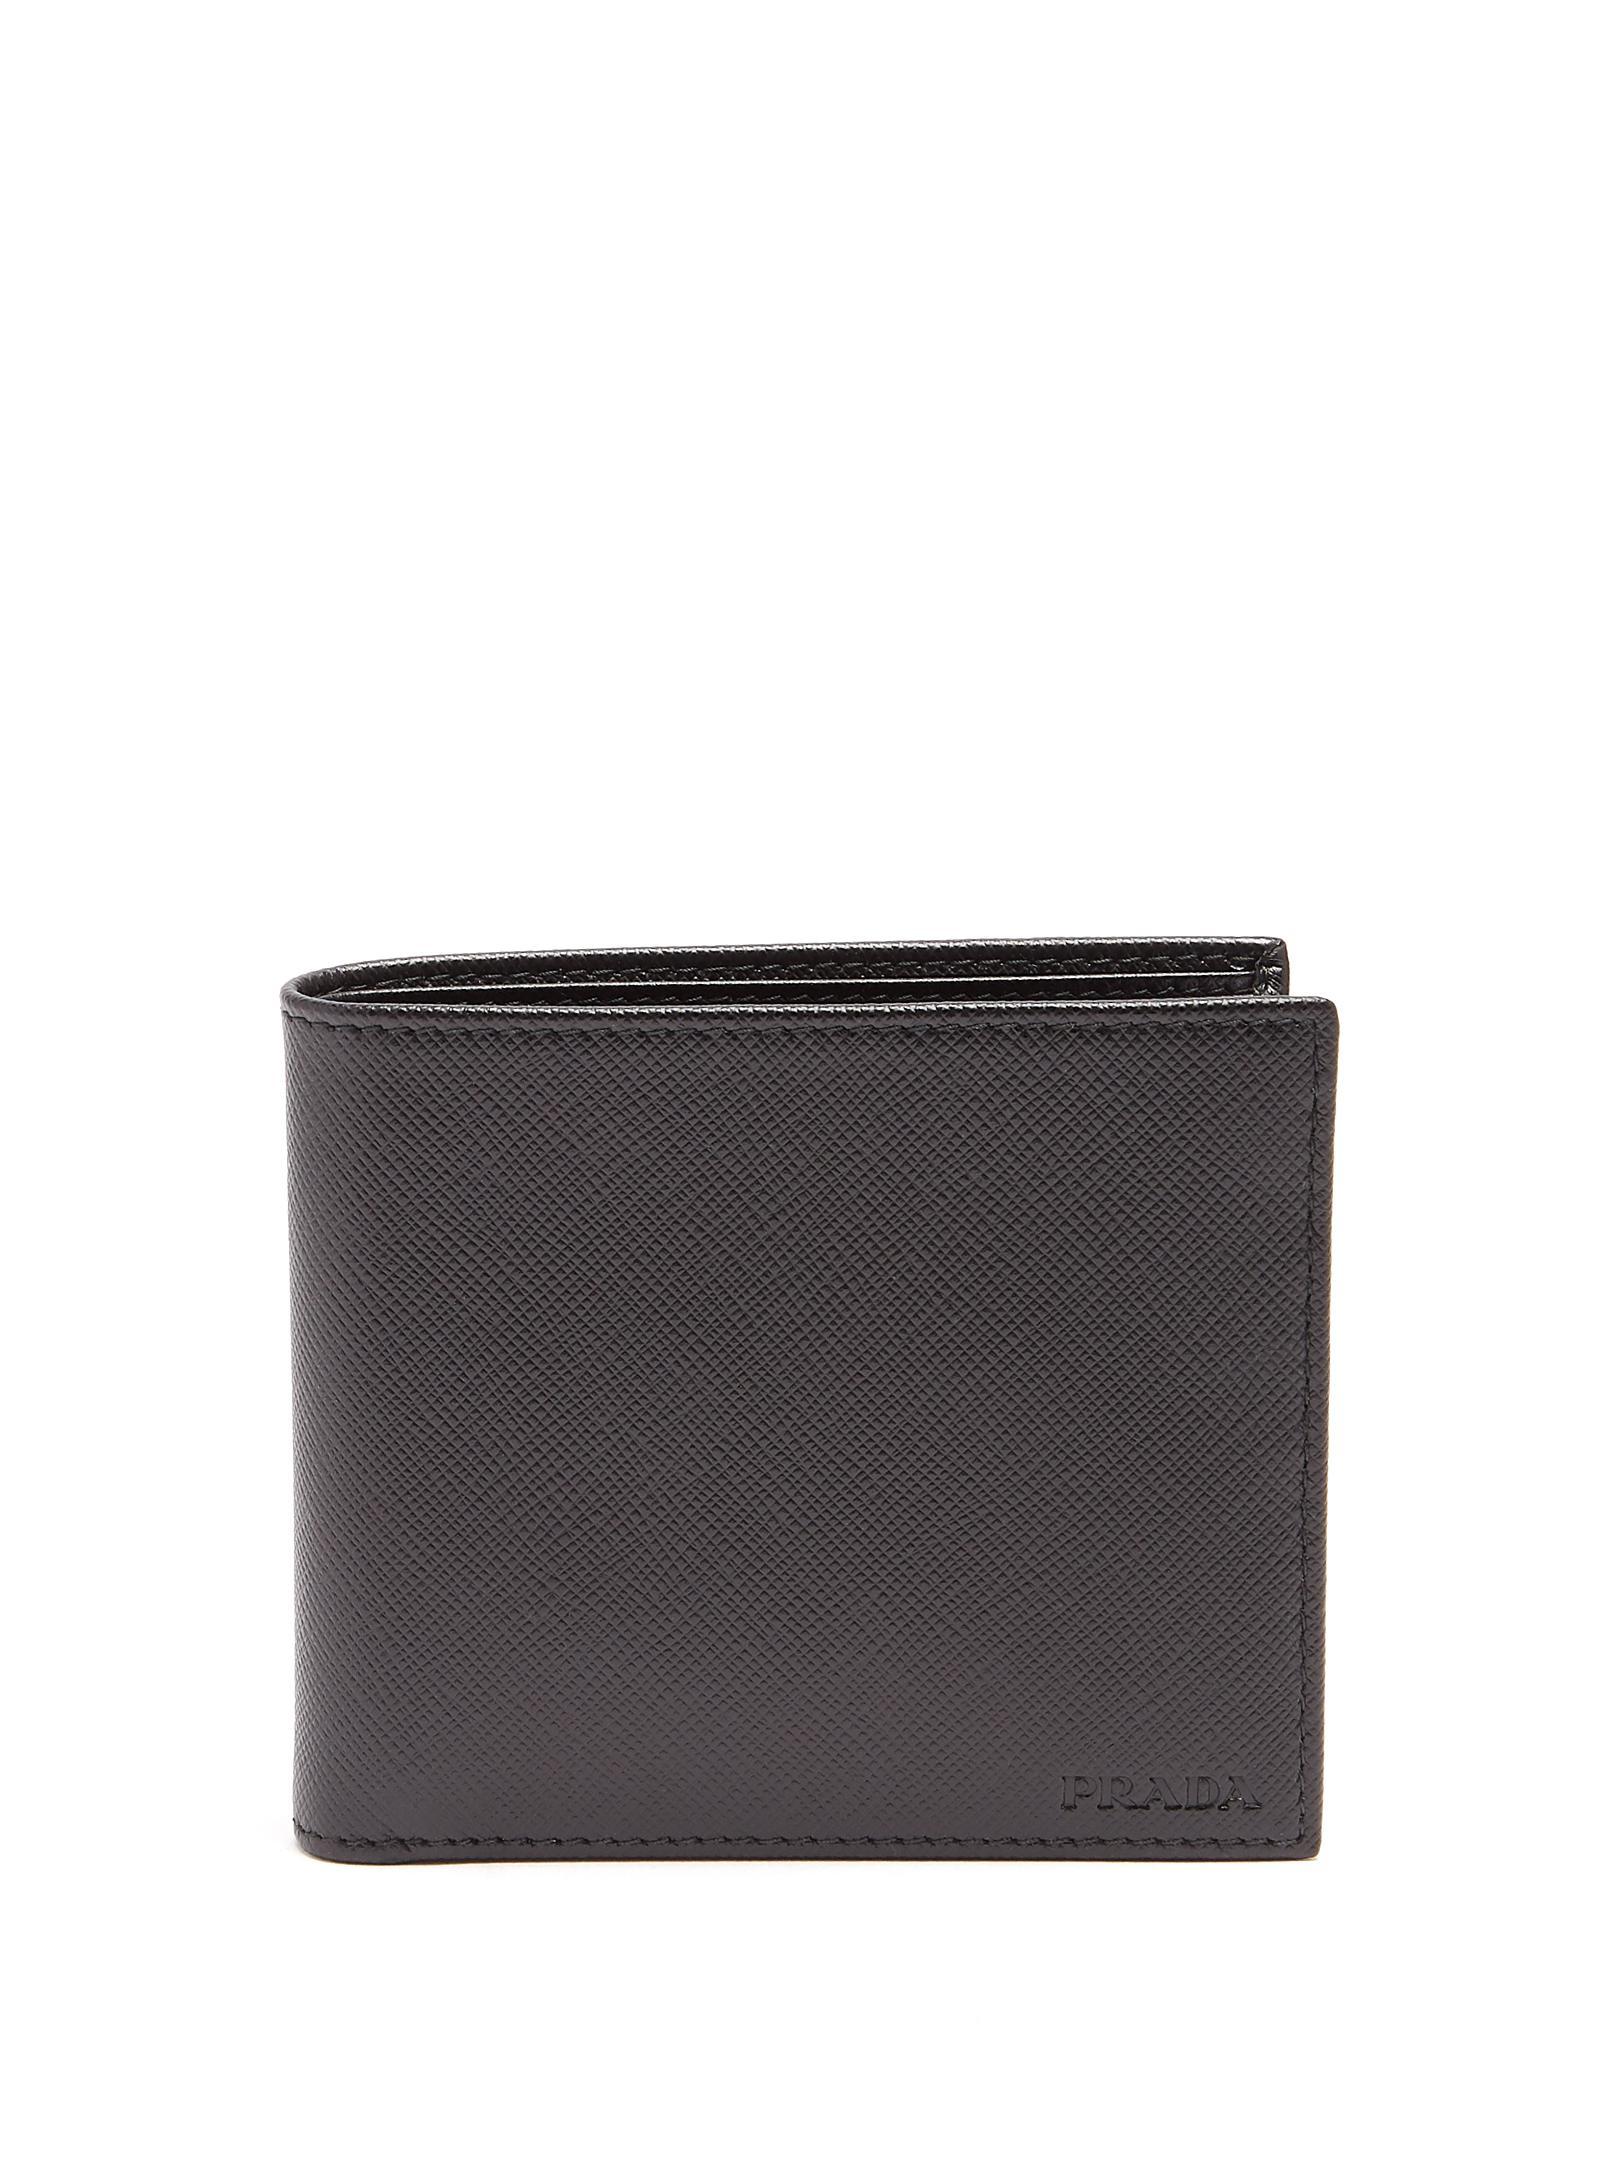 d831235045cd Lyst - Prada Saffiano-leather Bi-fold Wallet in Black for Men